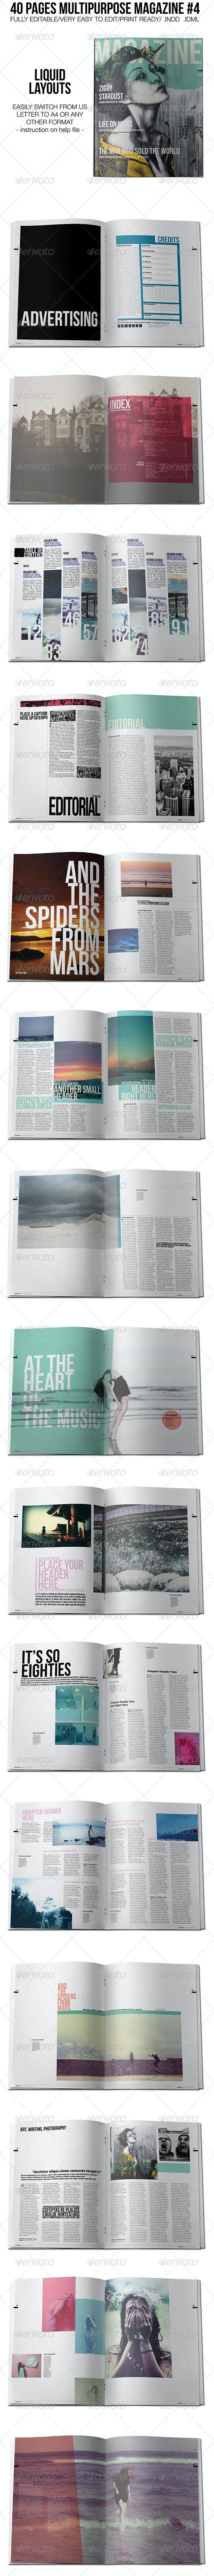 40 Pages Multipurpose Magazine 4 - Magazines Print Templates